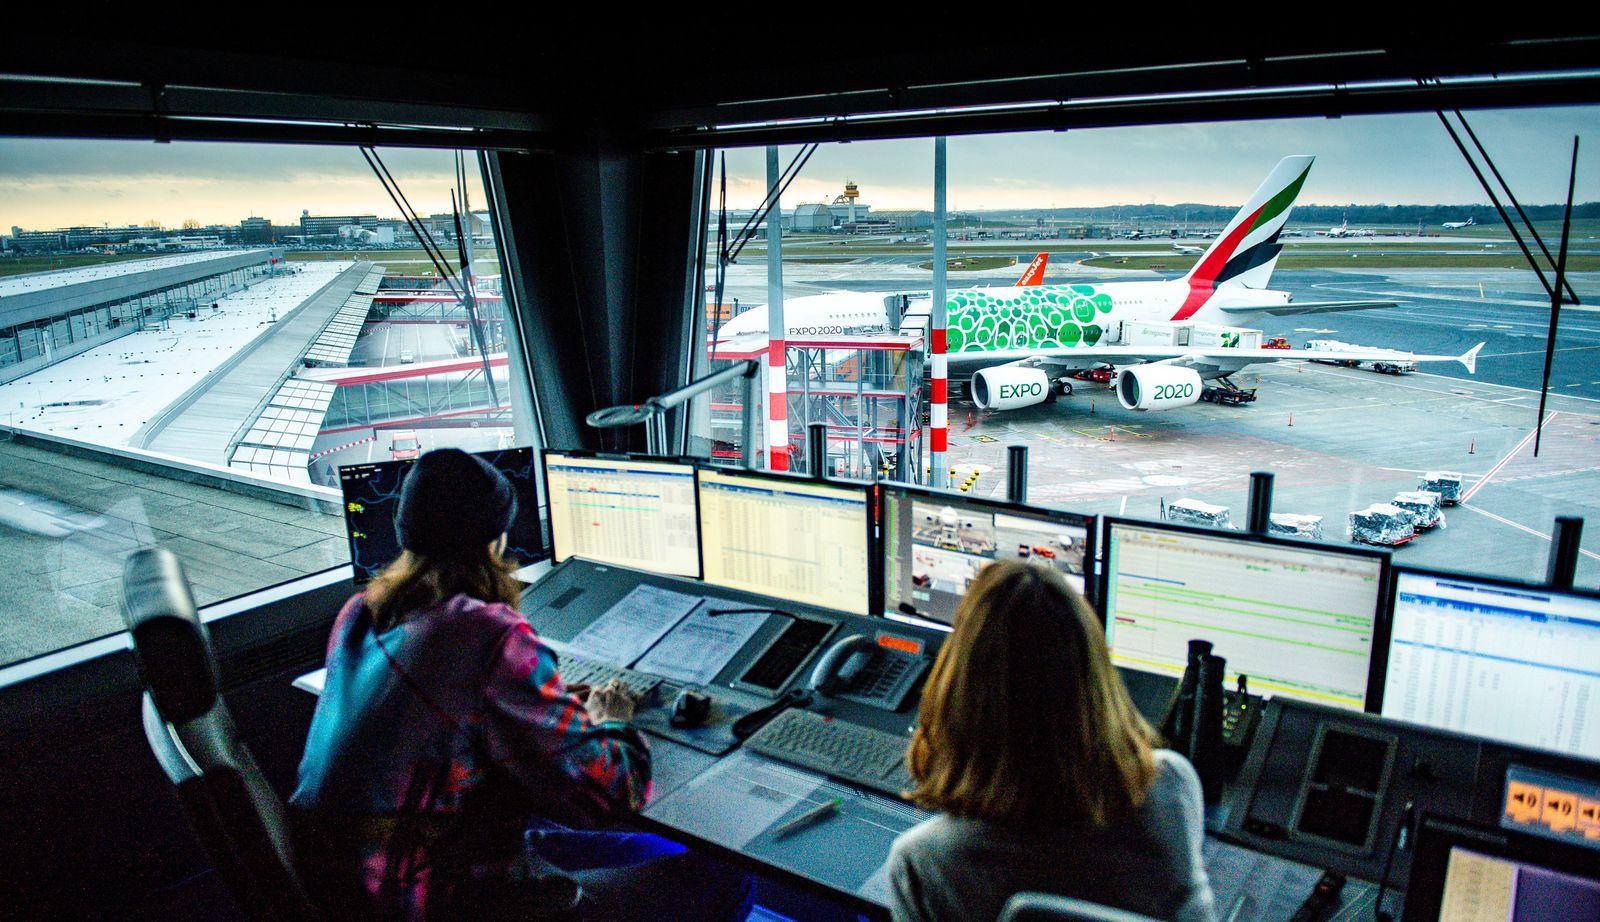 Flughafen Hamburg / Tower / Bodenlotsen